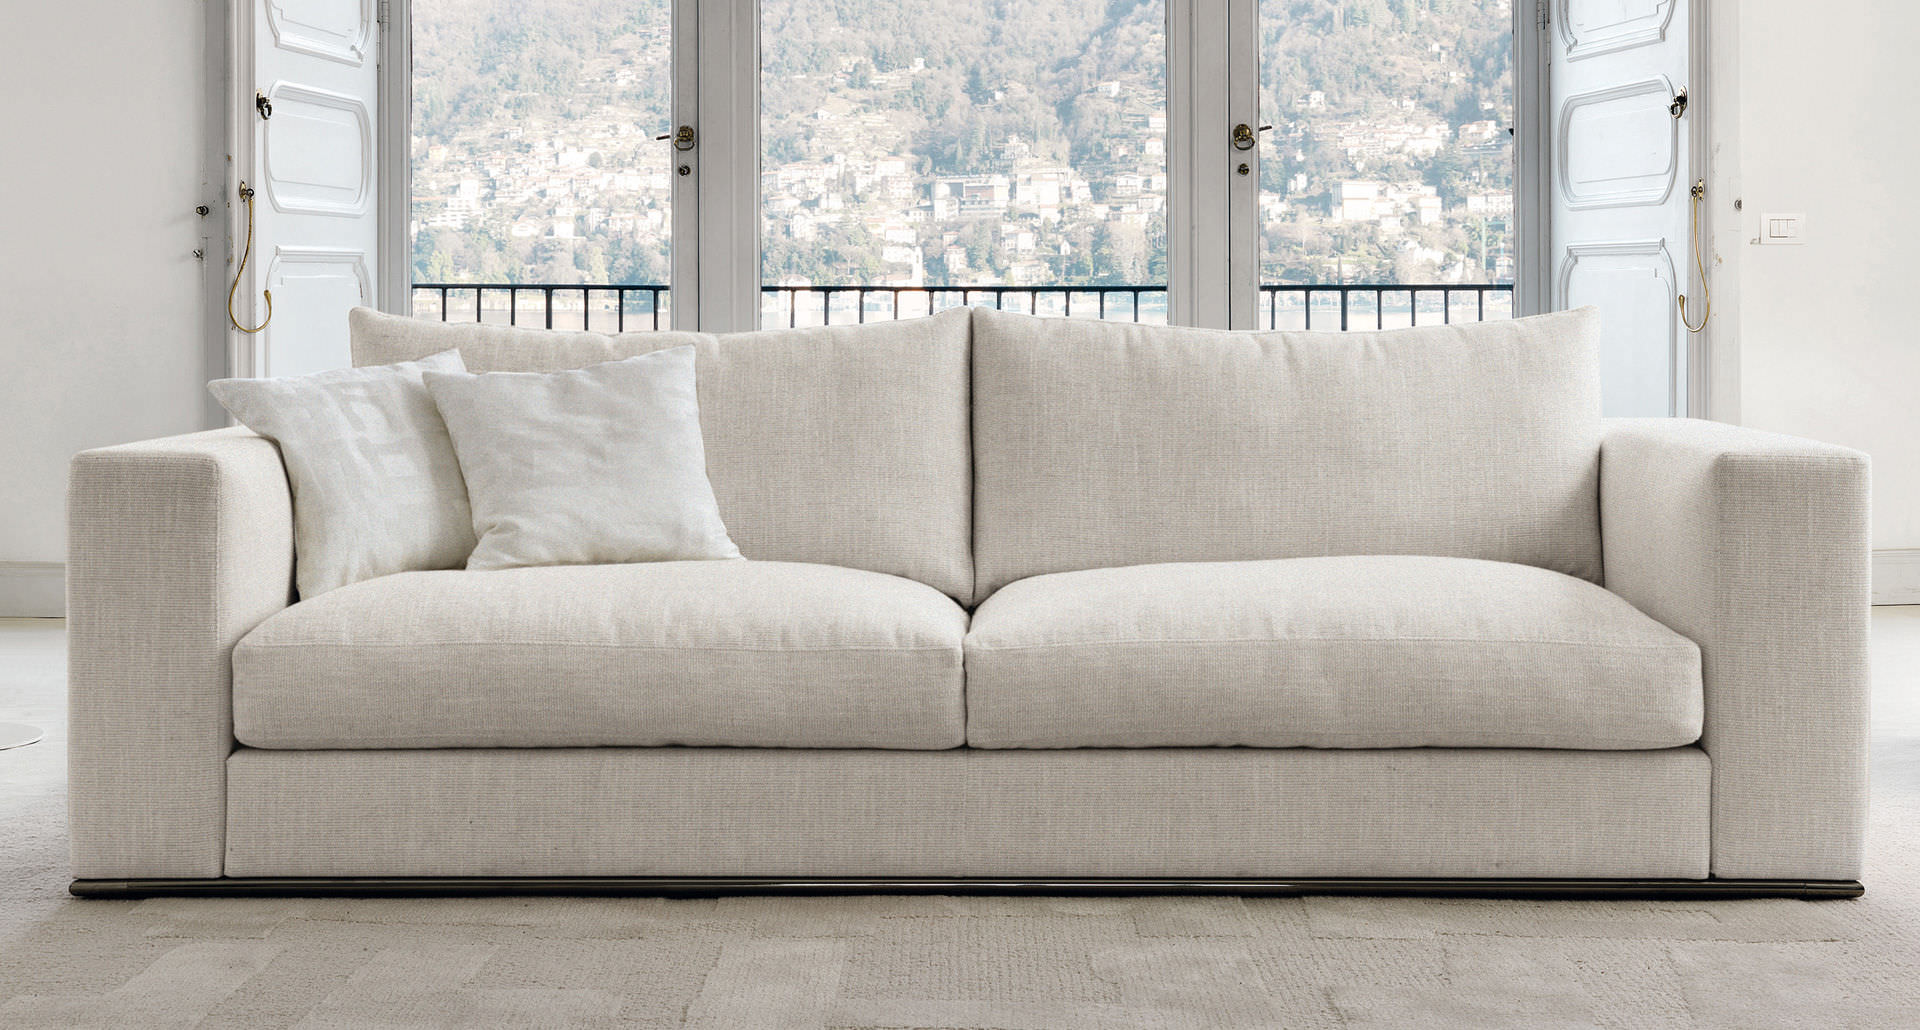 How To Judge A Sofa For Quality Etch